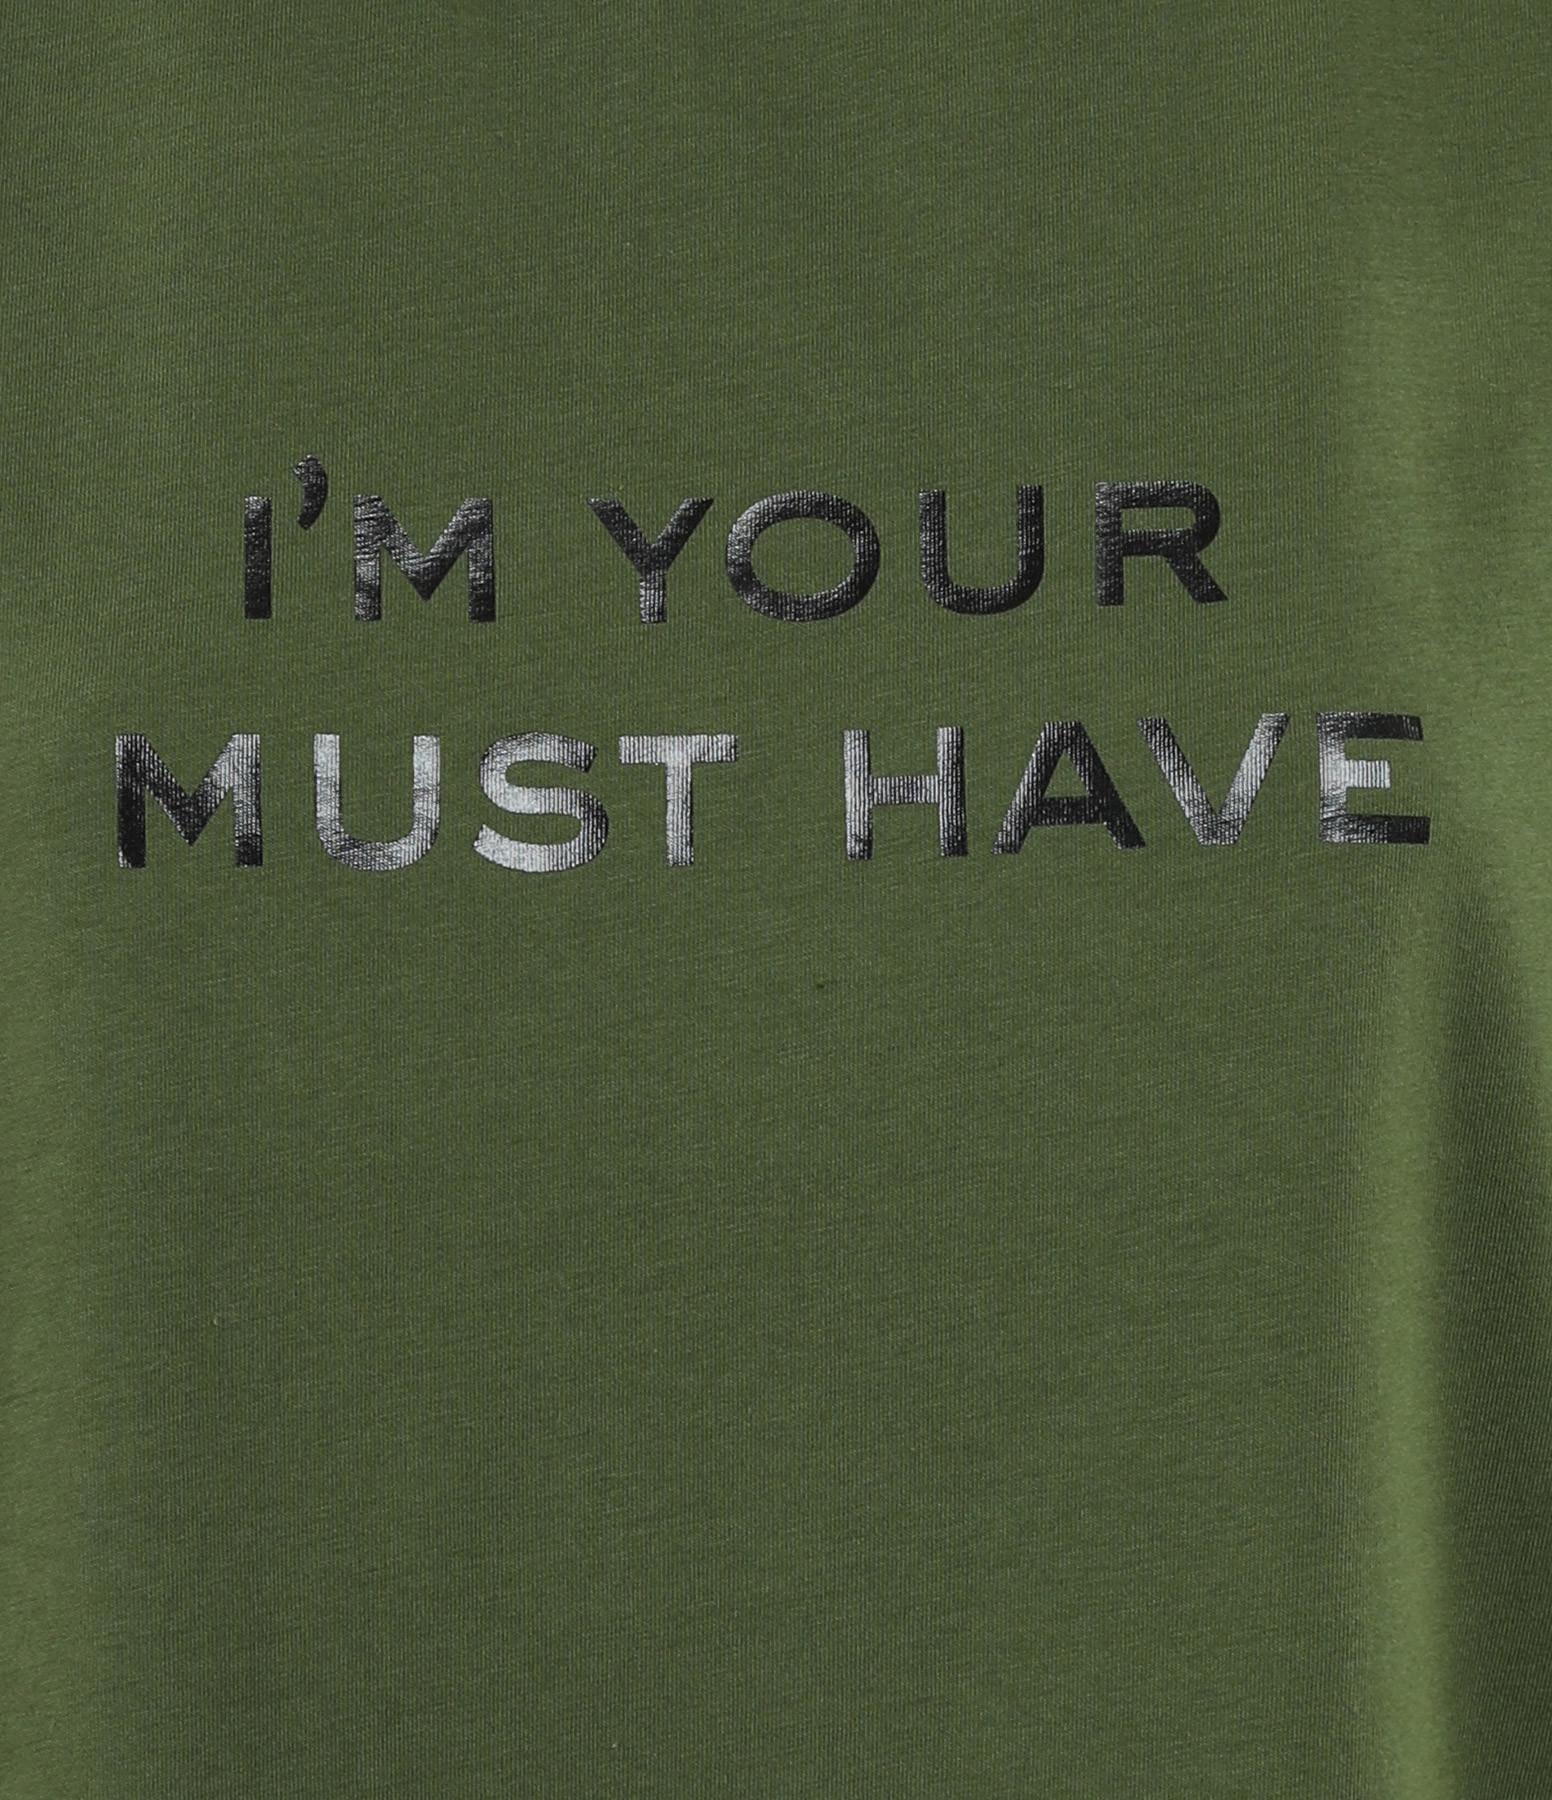 MAJESTIC FILATURES - Tee-shirt Col Rond New Coton Kaki, Cindy Bruna